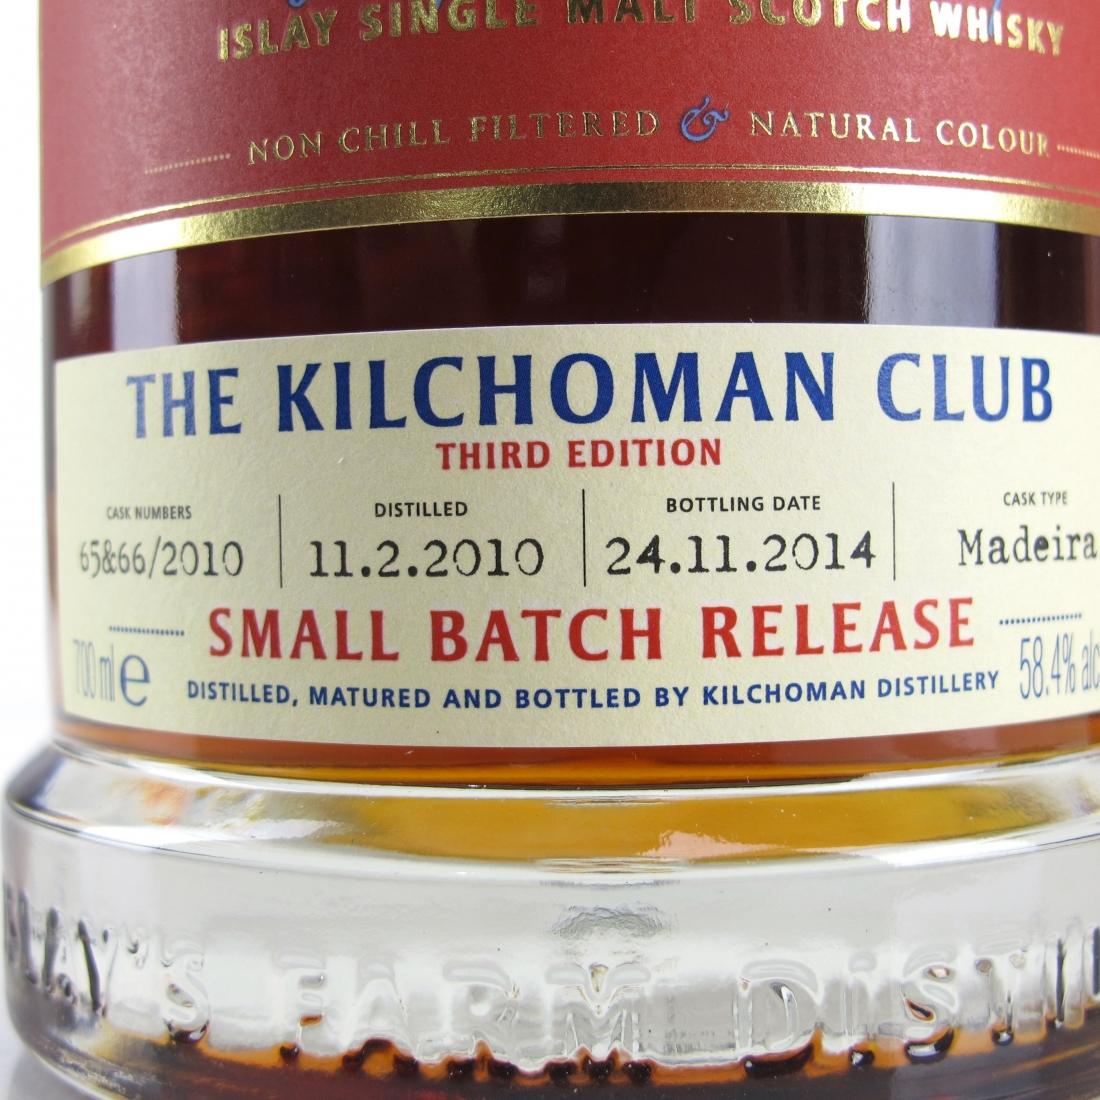 Kilchoman 2010 Small Batch / Kilchoman Club 3rd Edition